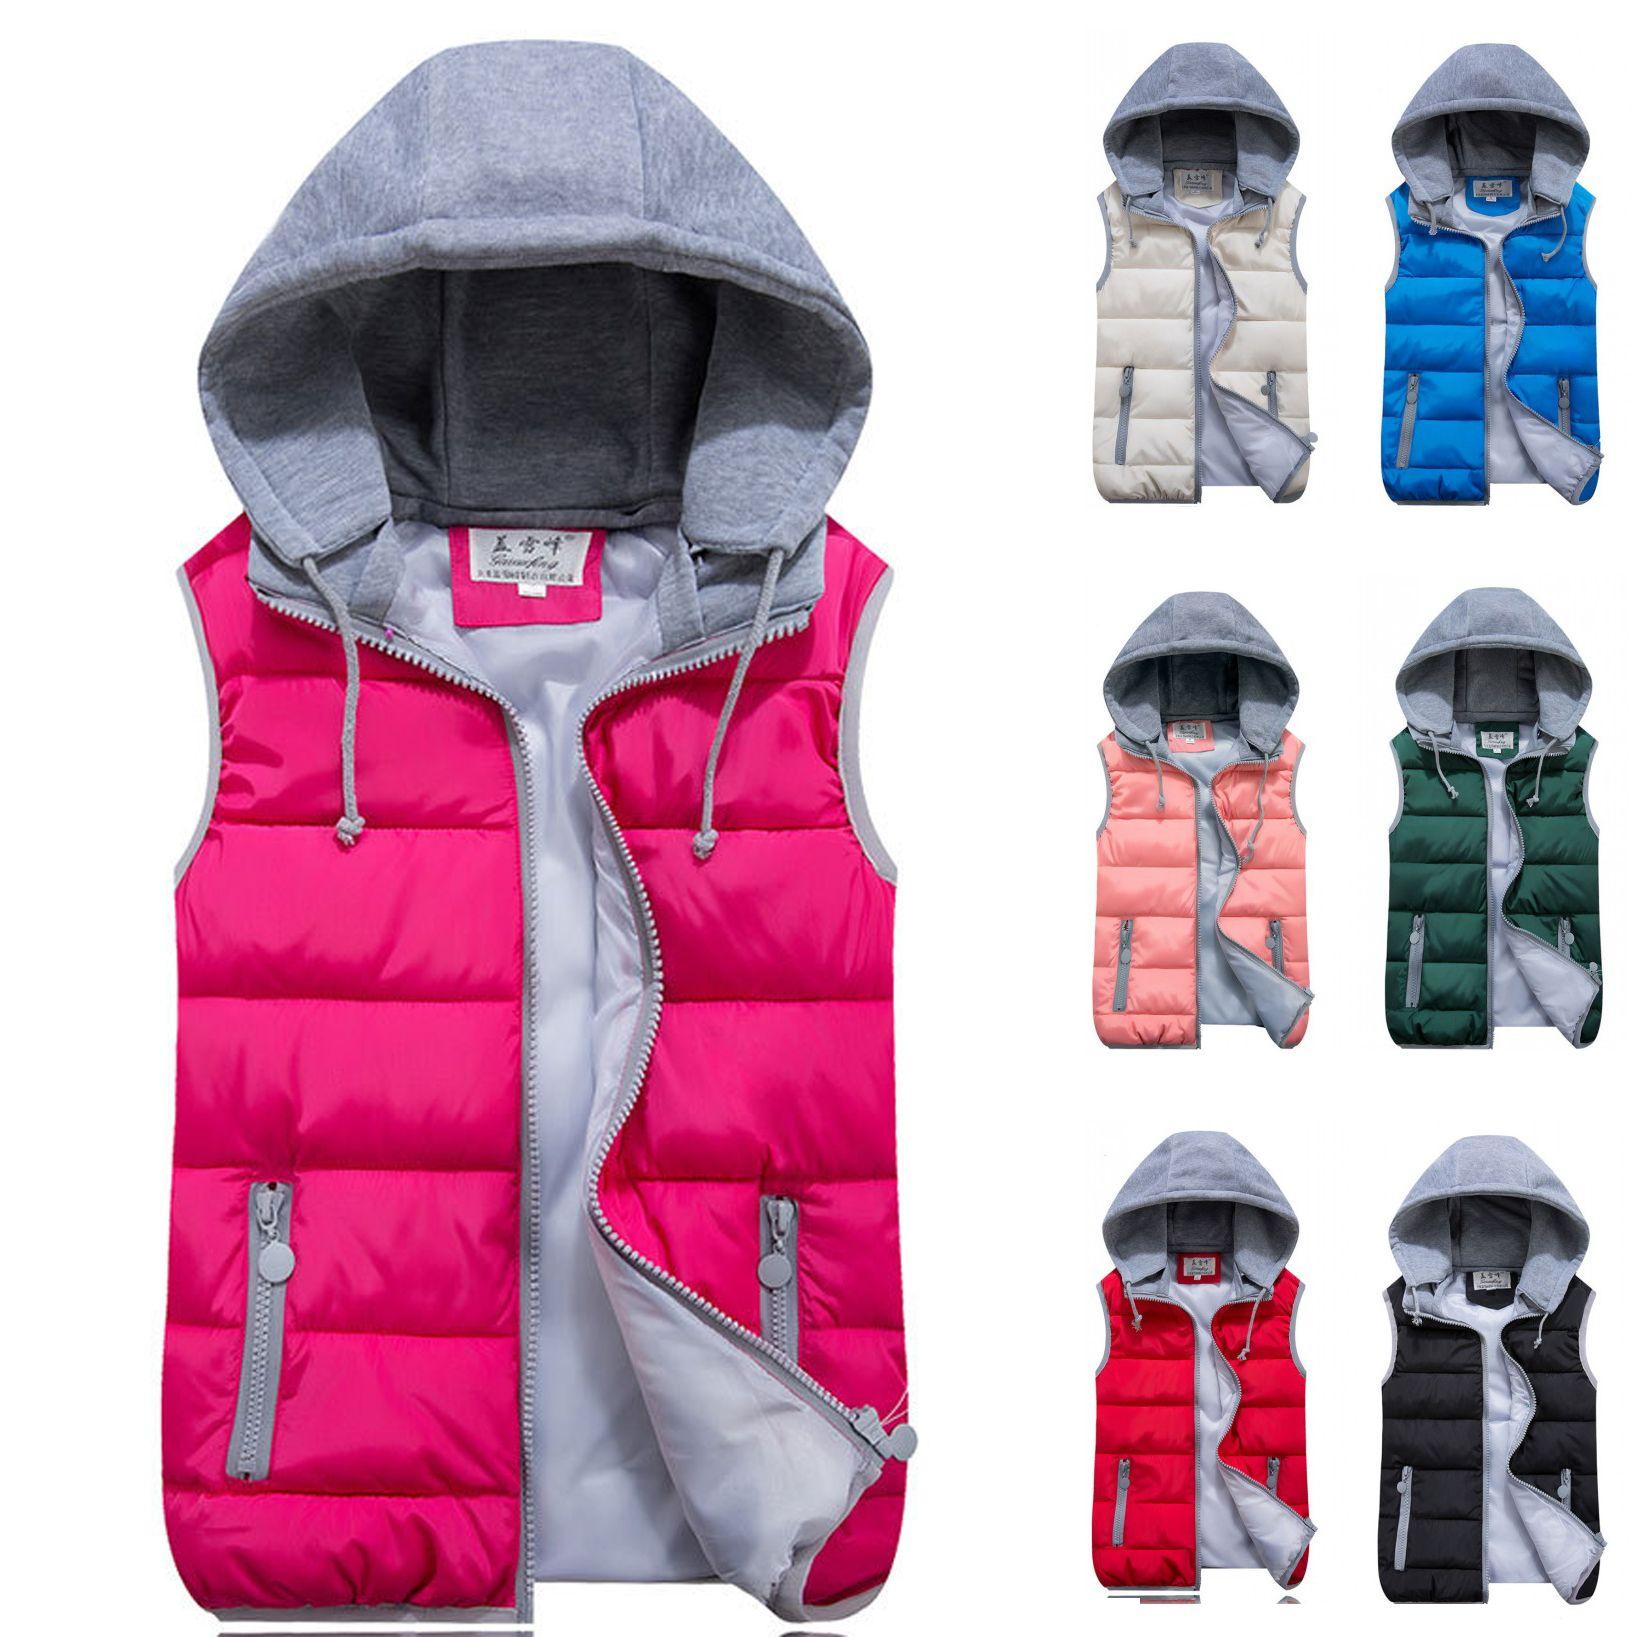 ed2b8391418 Kids Girls Boys Down Cotton Waistcoat Zipper Winter Warm Thicken Vest  Hooded Children Sleevess Coat Jacket One Kid Down Coat Toddler Boys Down  Jacket From ...